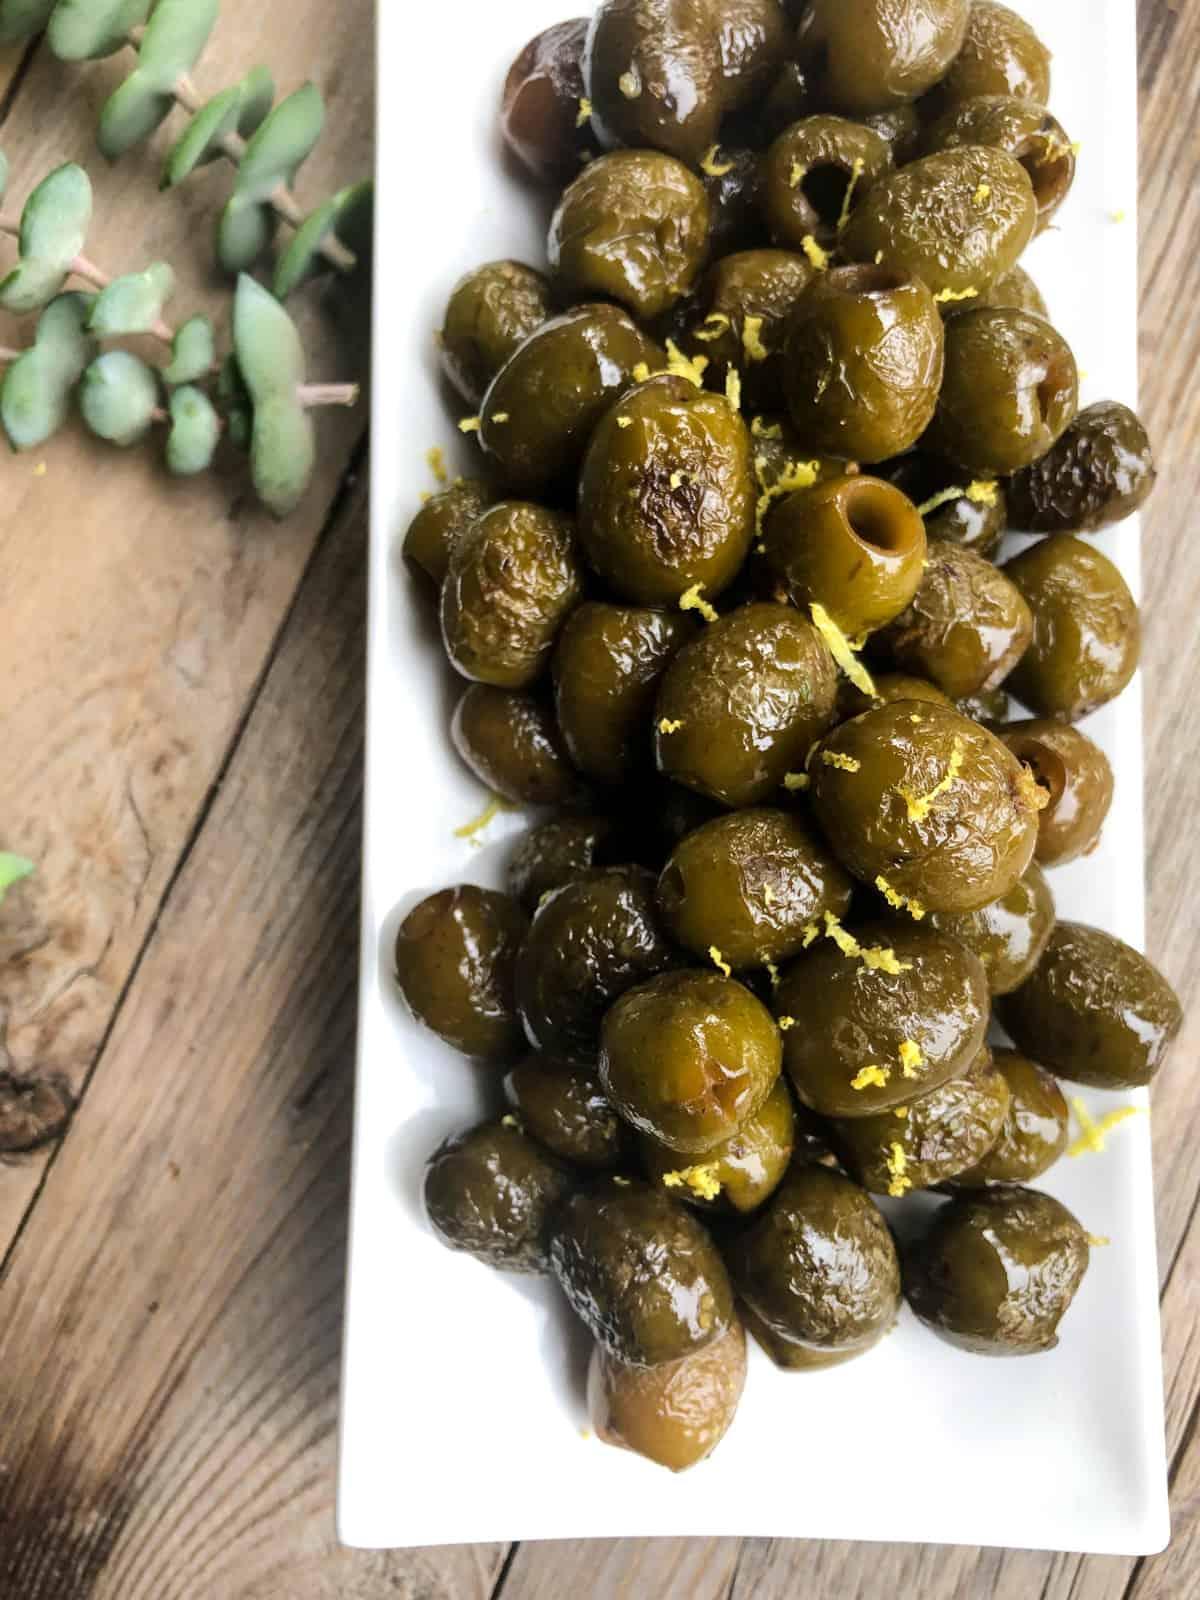 10 Amazing Recipes Using Canned Olives